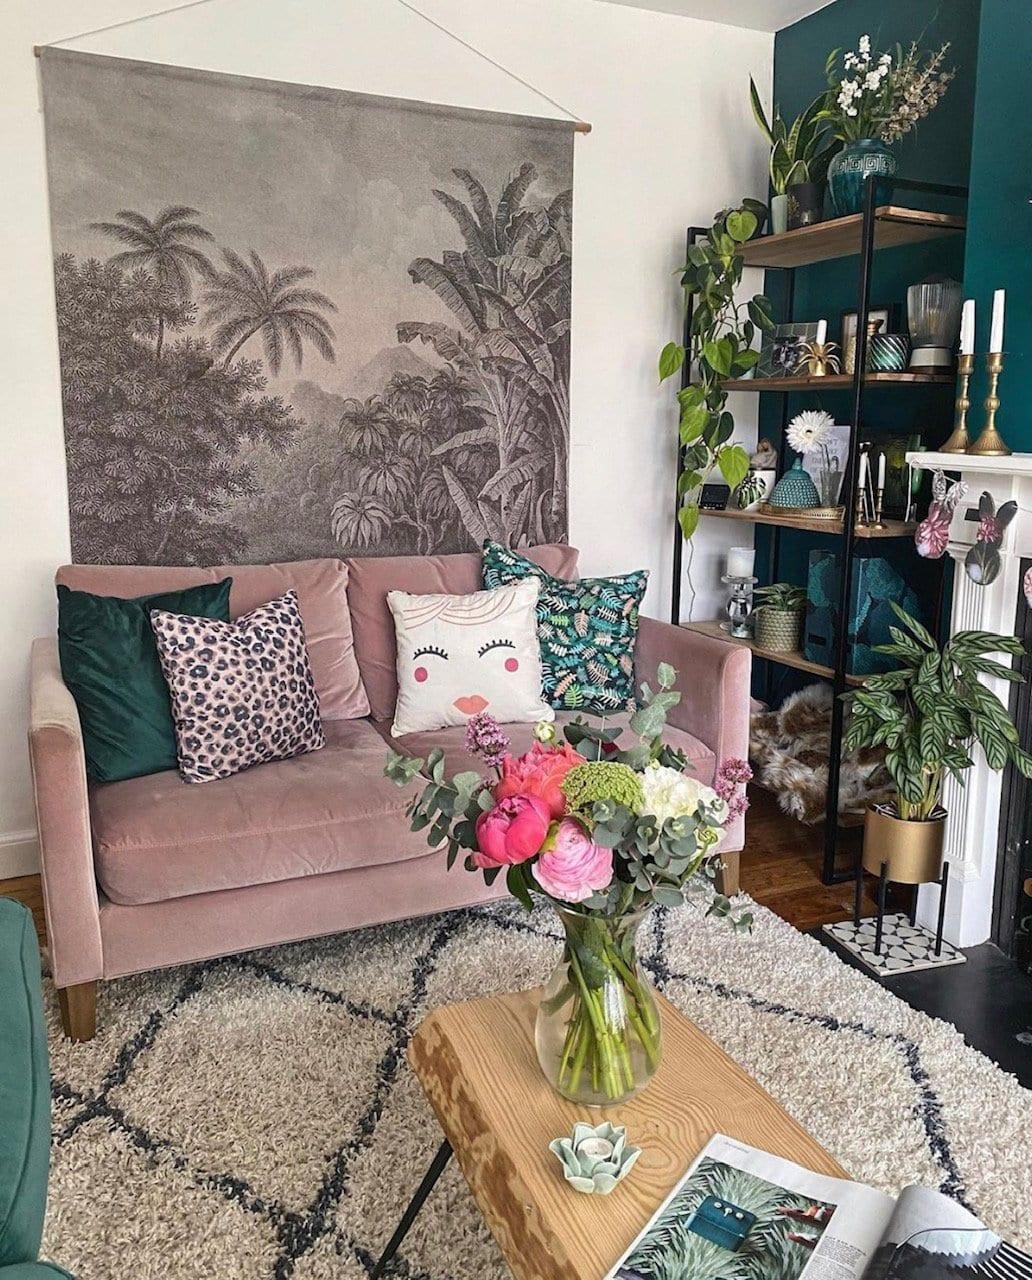 trends, interior trends, interiors, tropical, tropical trends, tropical interiors, botanical, tropical vibe, holiday vibe, home decor, home decor ideas, interior design, interior designer, garden, home, property